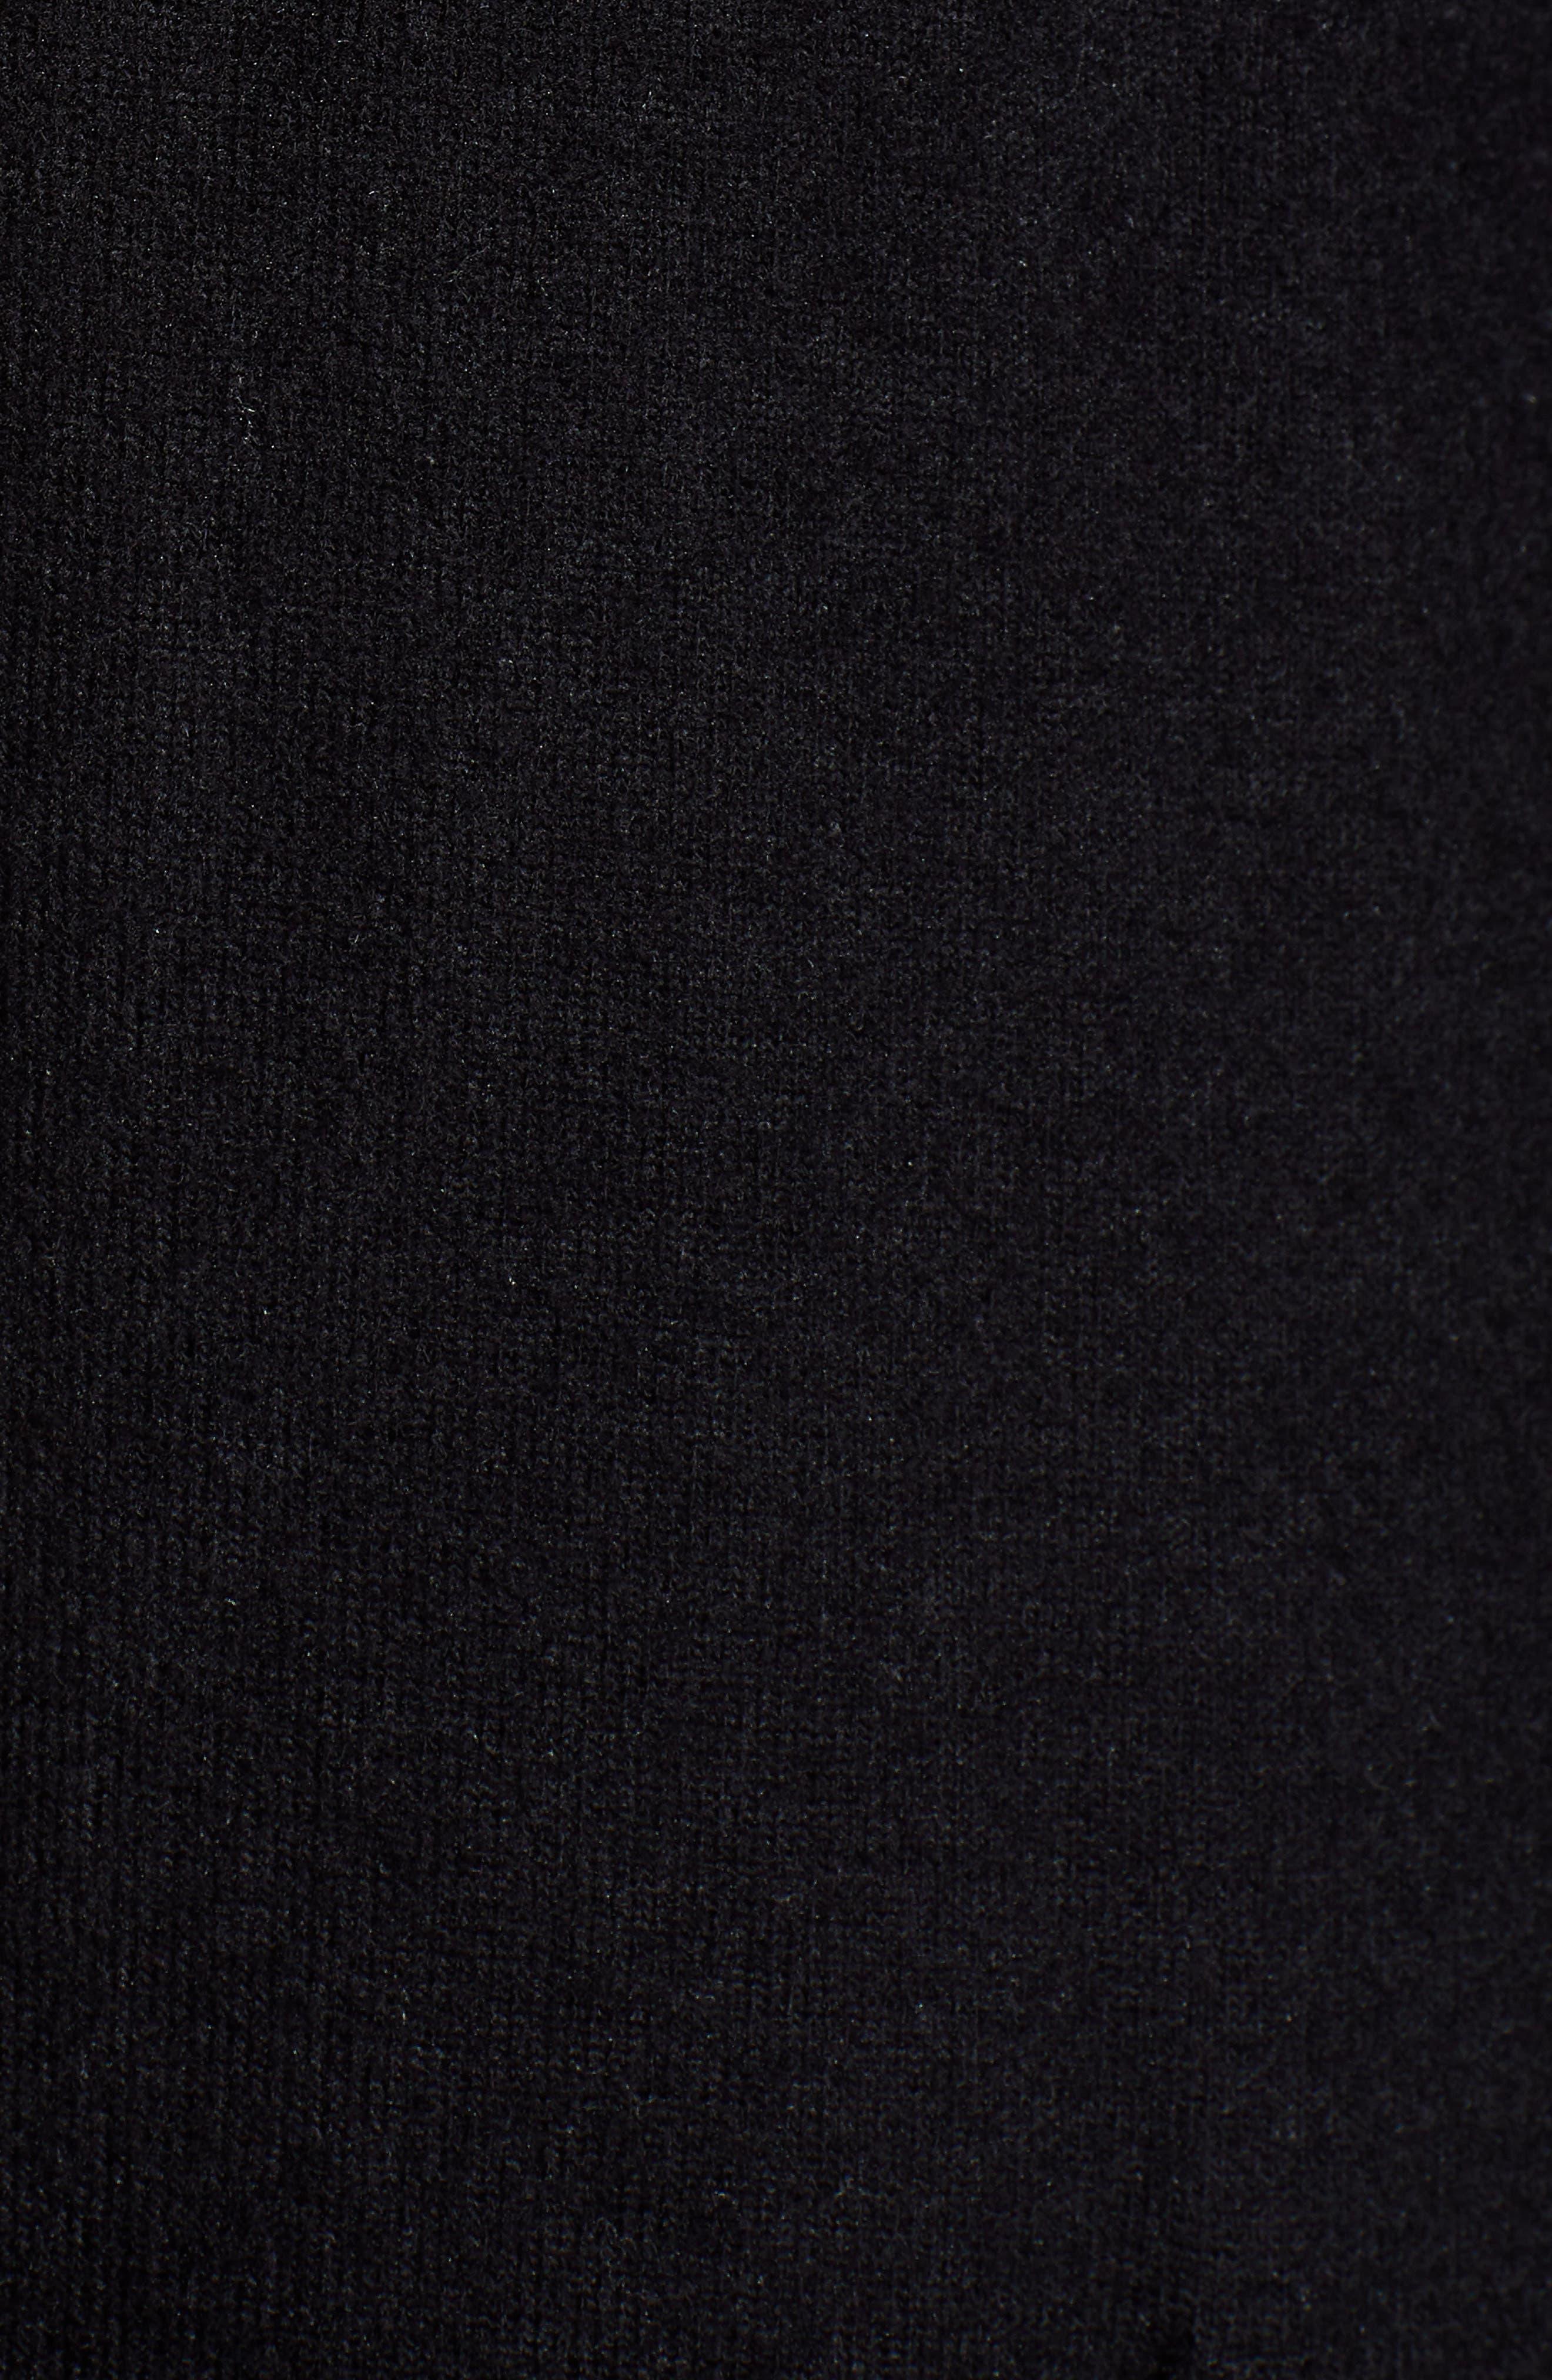 Long Fleece Open Cardigan,                             Alternate thumbnail 6, color,                             Black